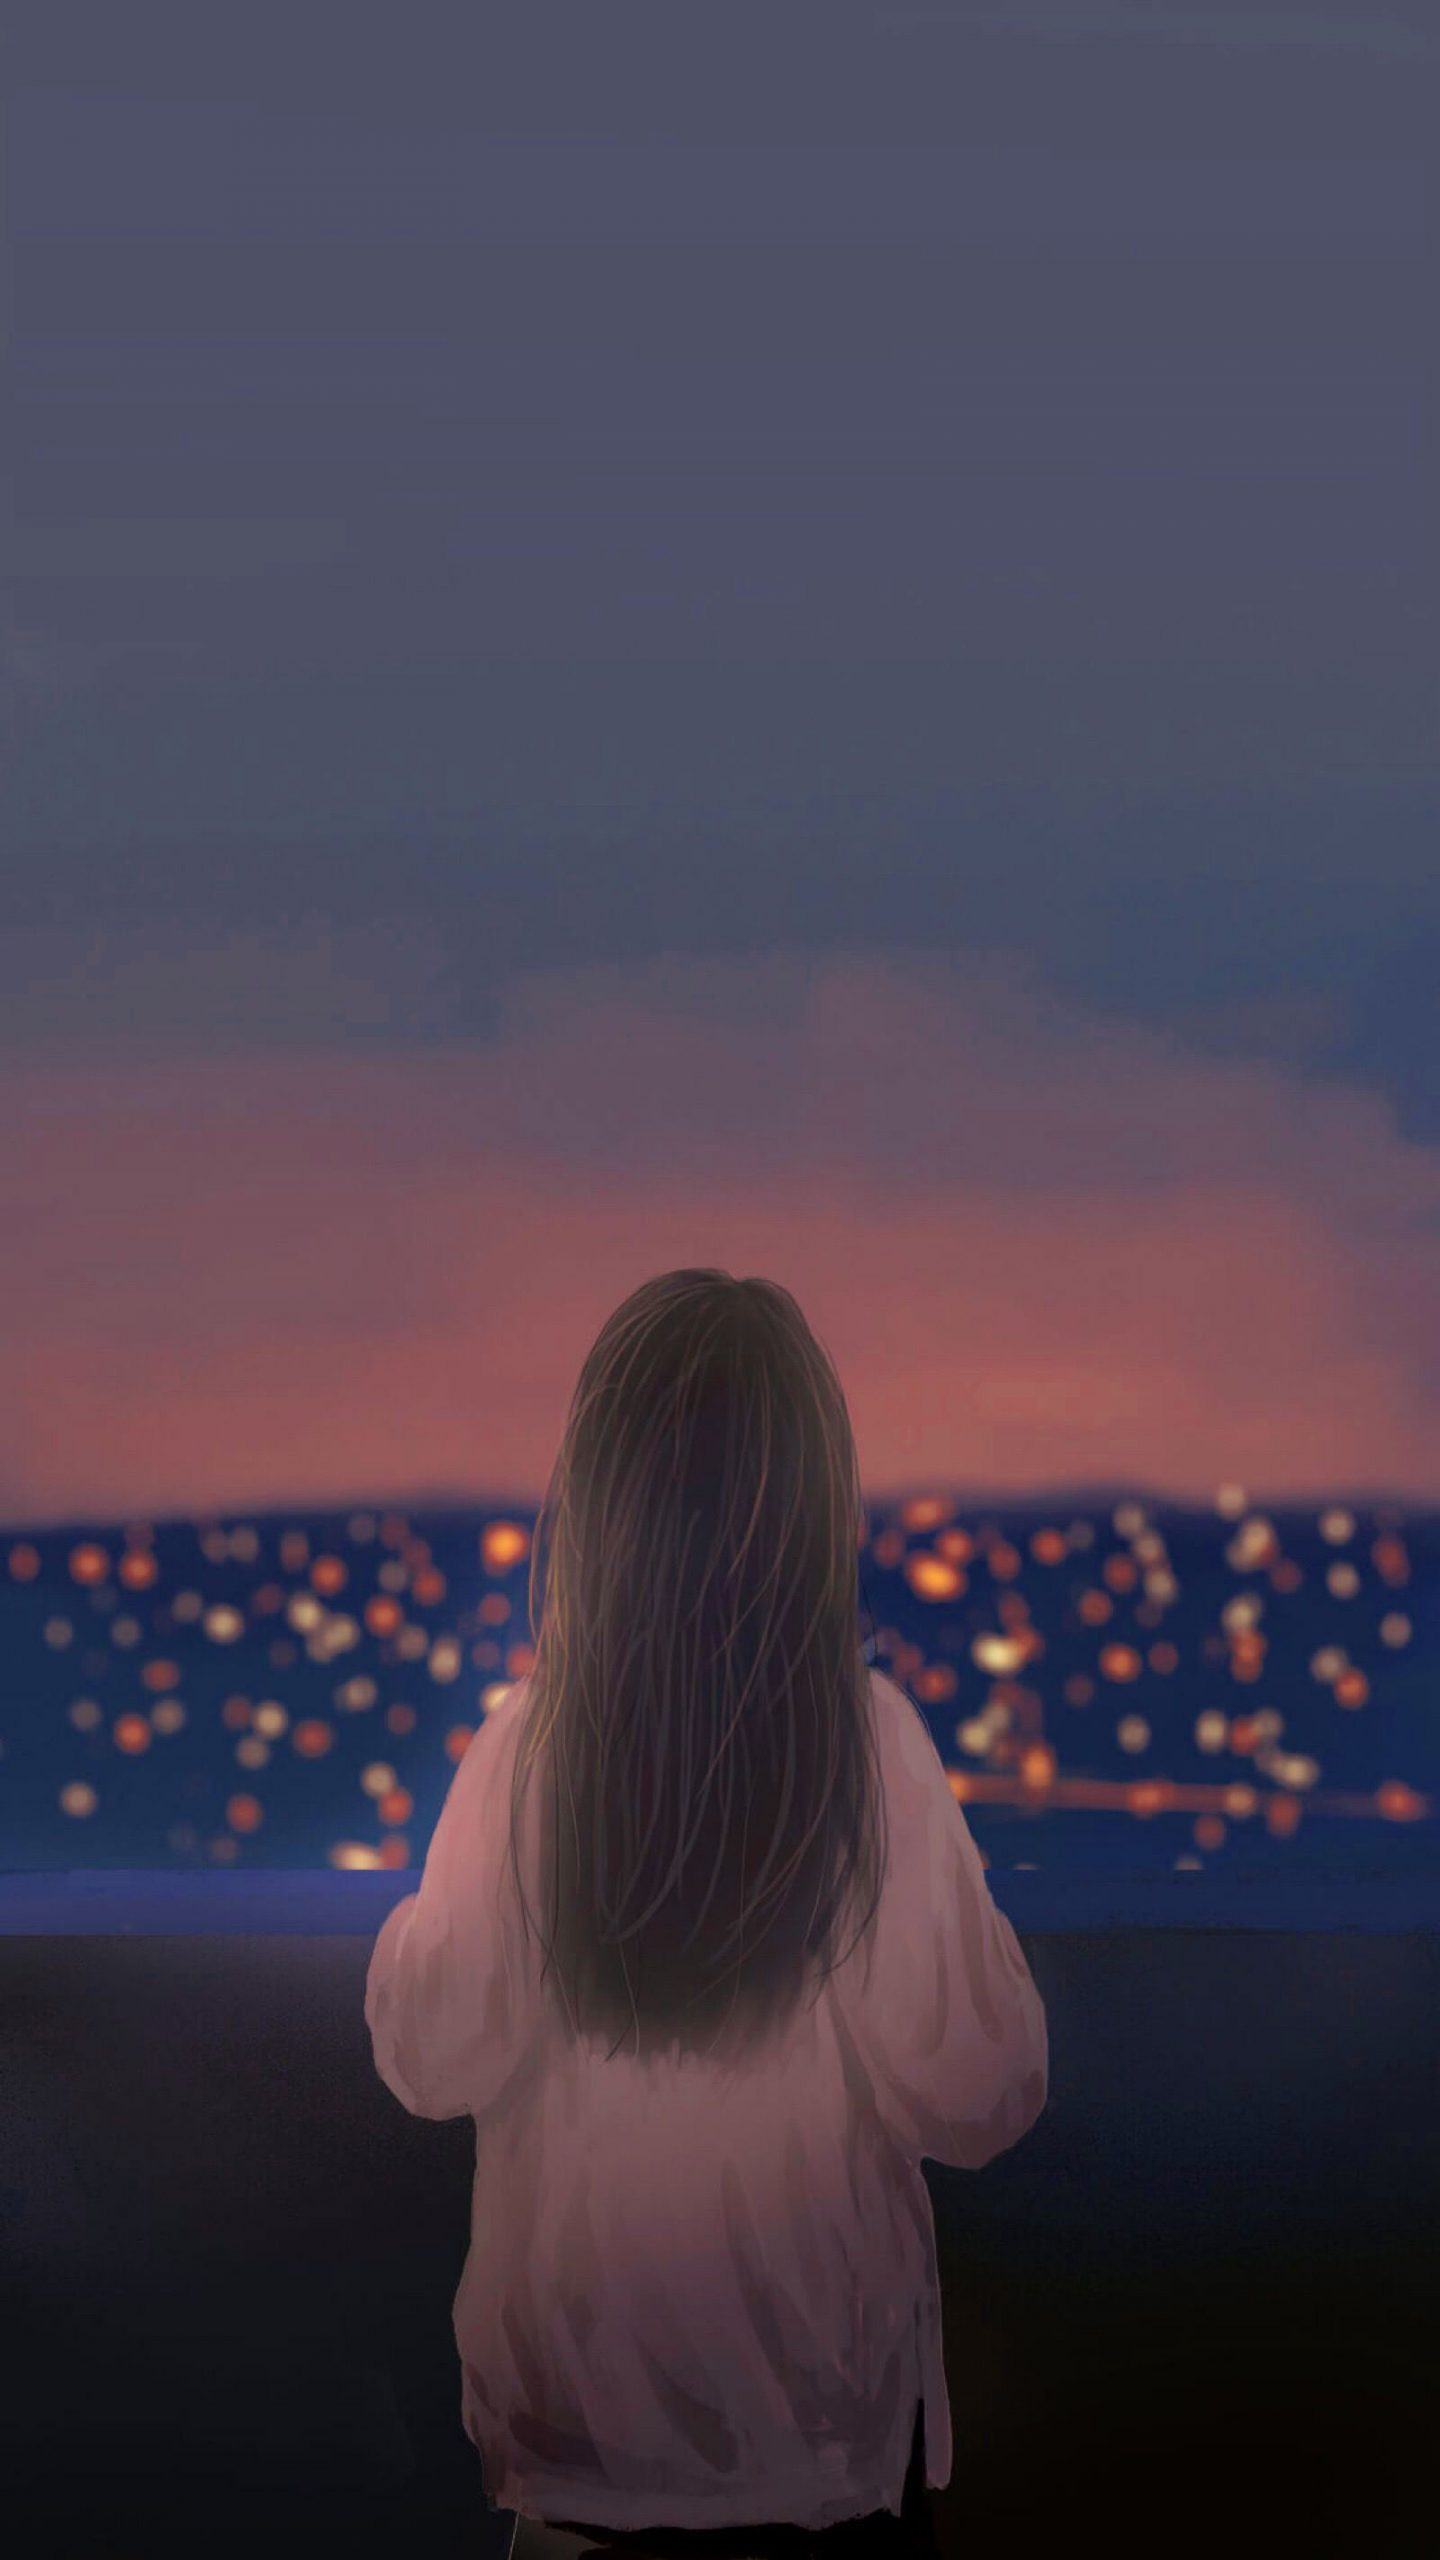 alone girl 1080p Latest Sad Cartoon Dp Images